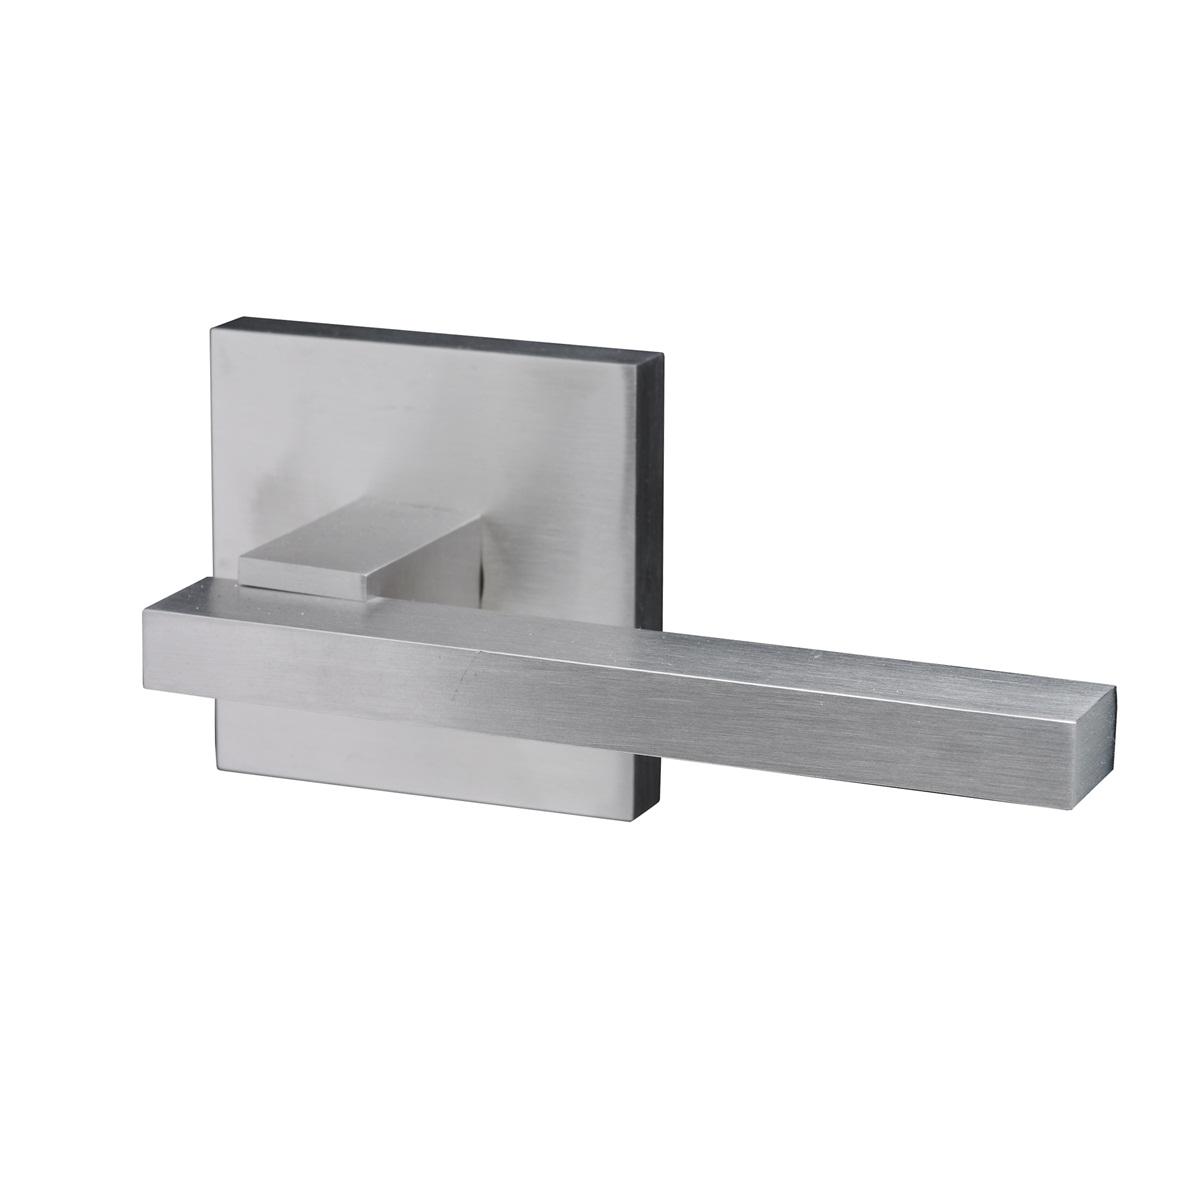 Linnea ll stainless steel lever